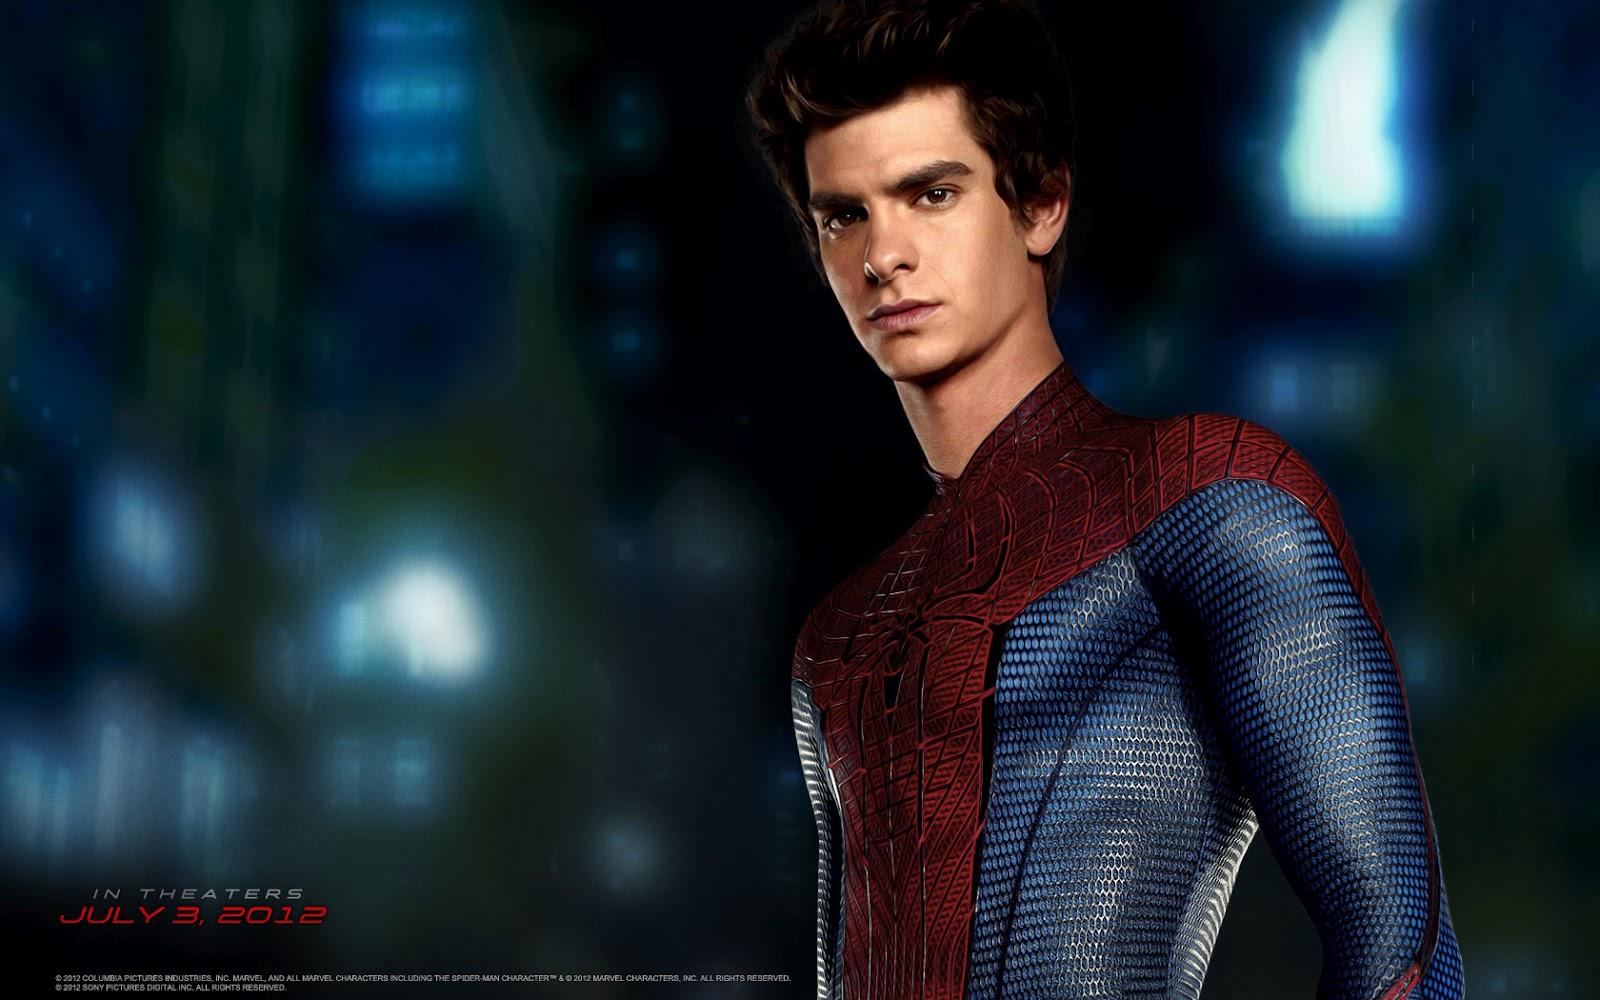 http://2.bp.blogspot.com/-_oMSLDIsQLg/T8iM0Mc5cwI/AAAAAAAAAzU/RanIwFmsUck/s1600/Andrew_Garfield_in_The_Amazing_Spider-Man_Wallpaper_7_1024.jpg